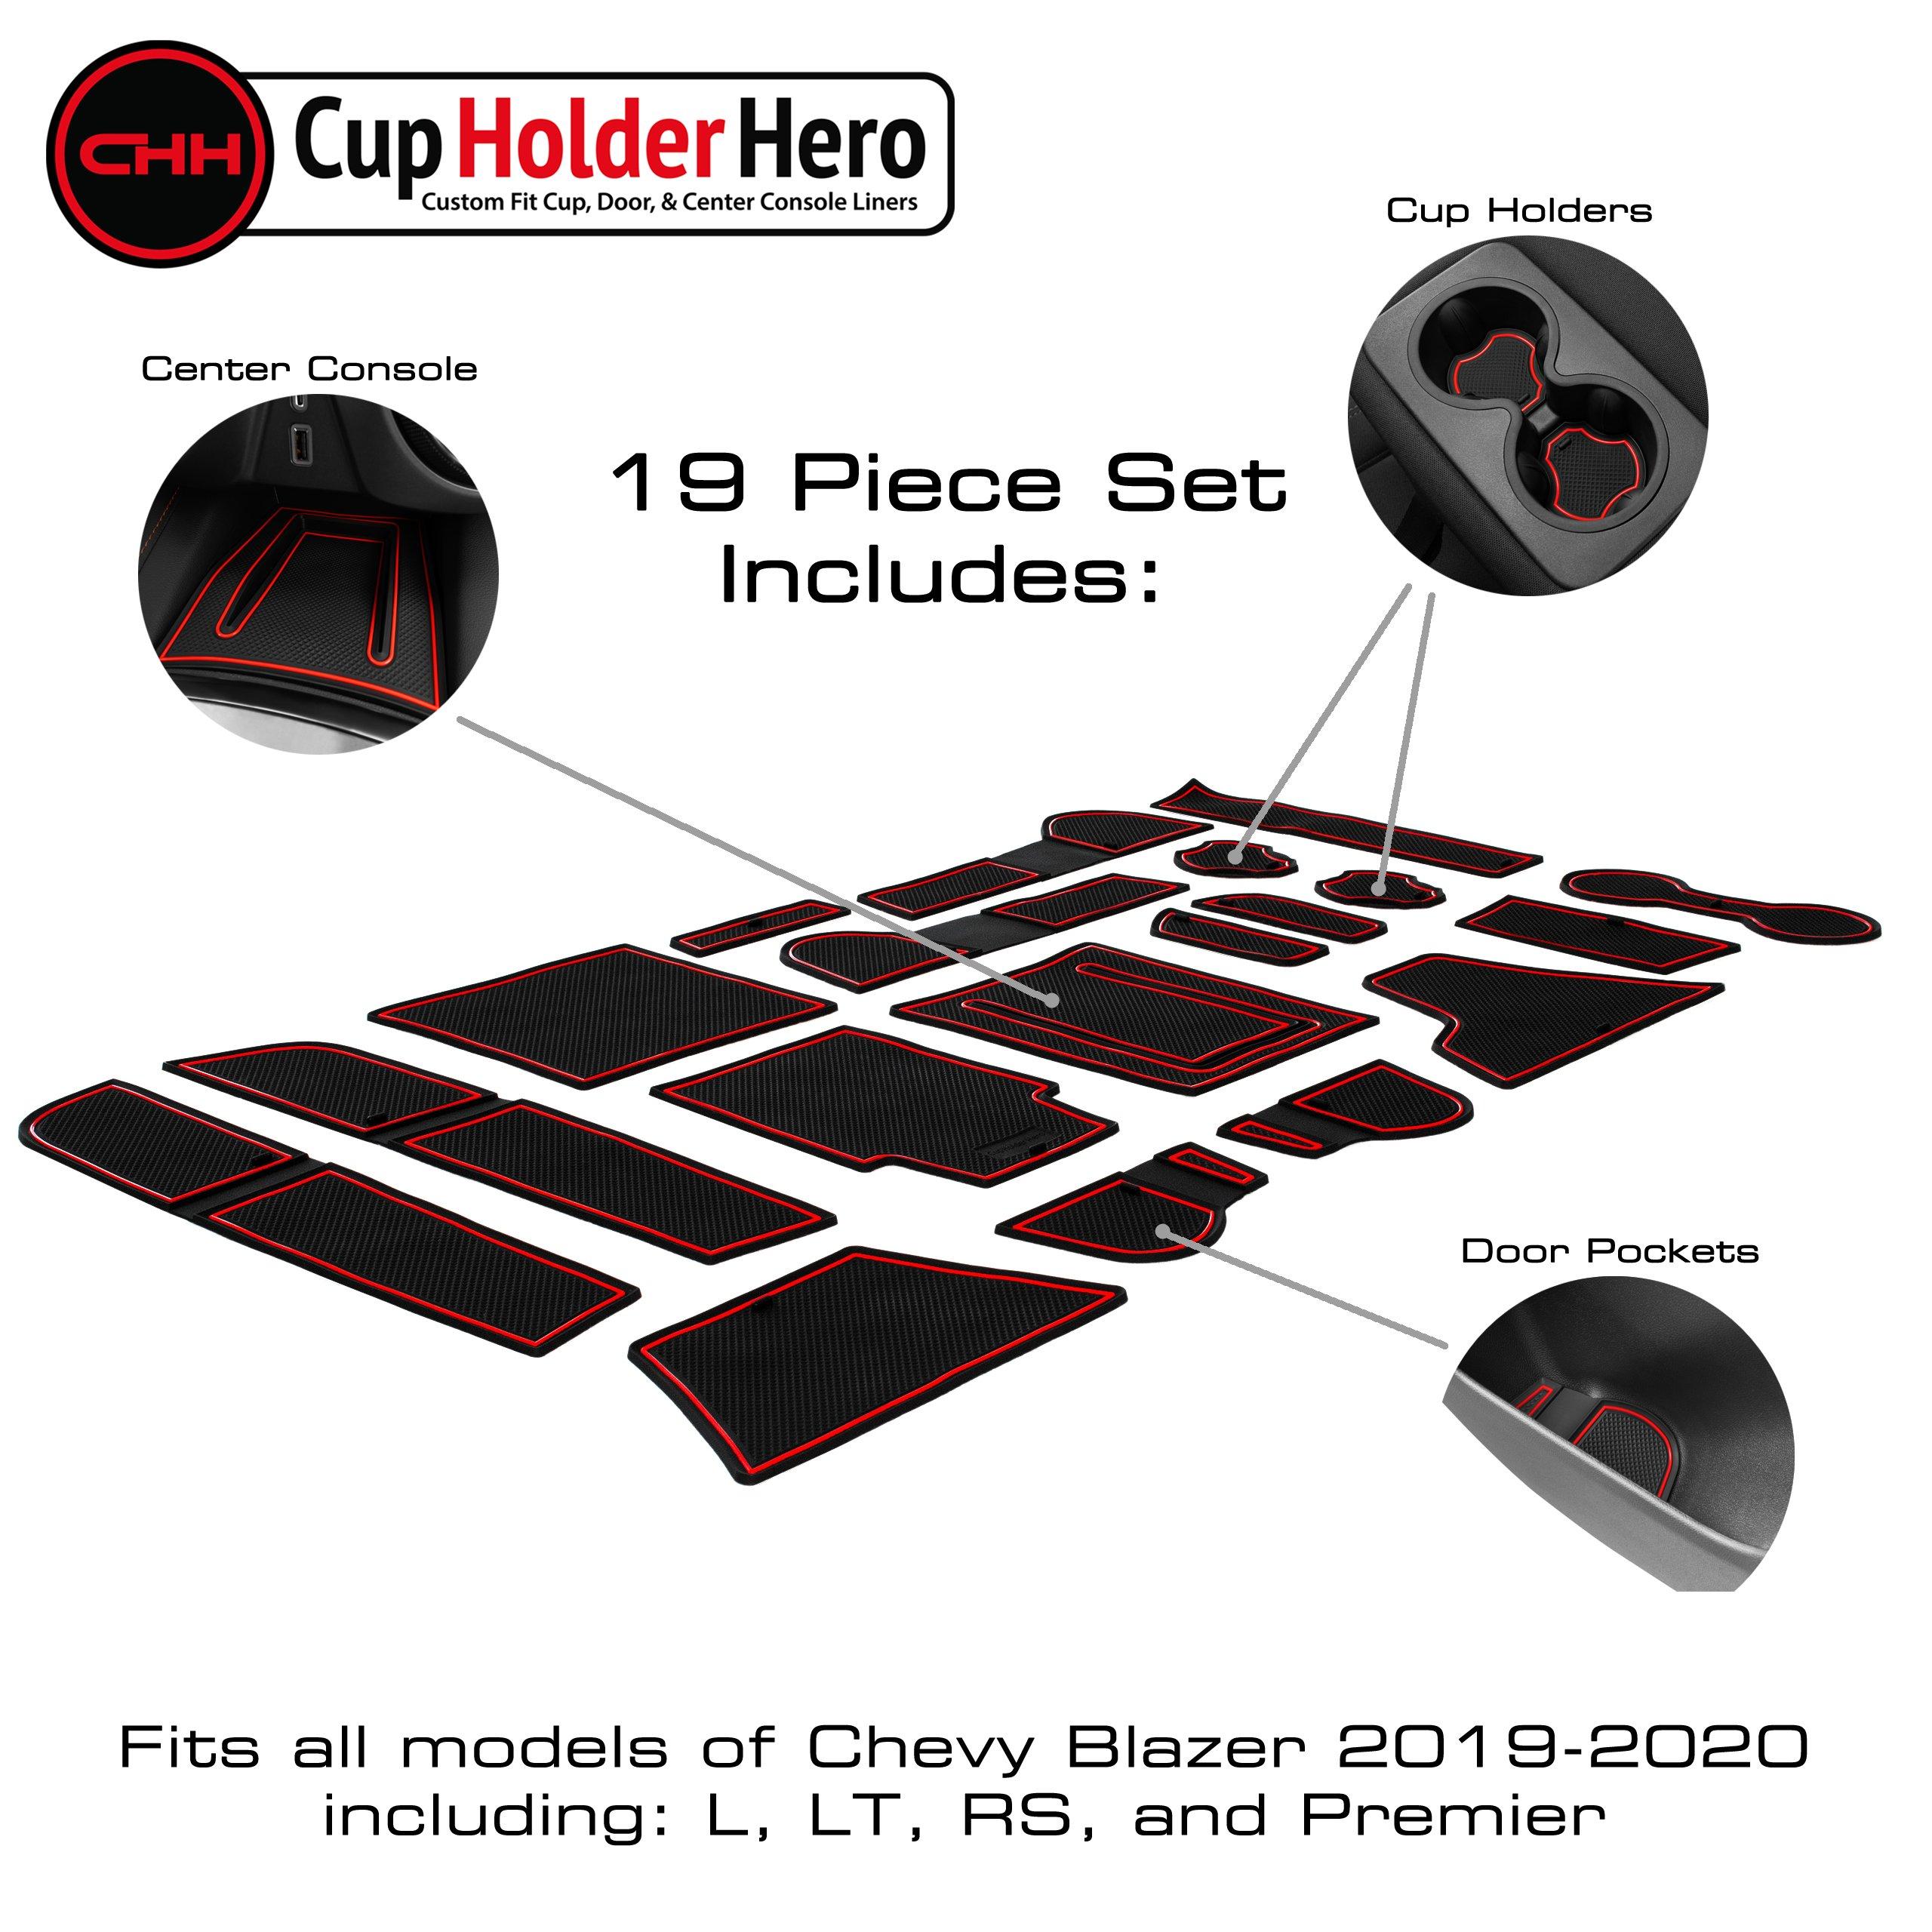 CupHolderHero-Chevy-Blazer-2019-2021-Liner-Accessories thumbnail 17